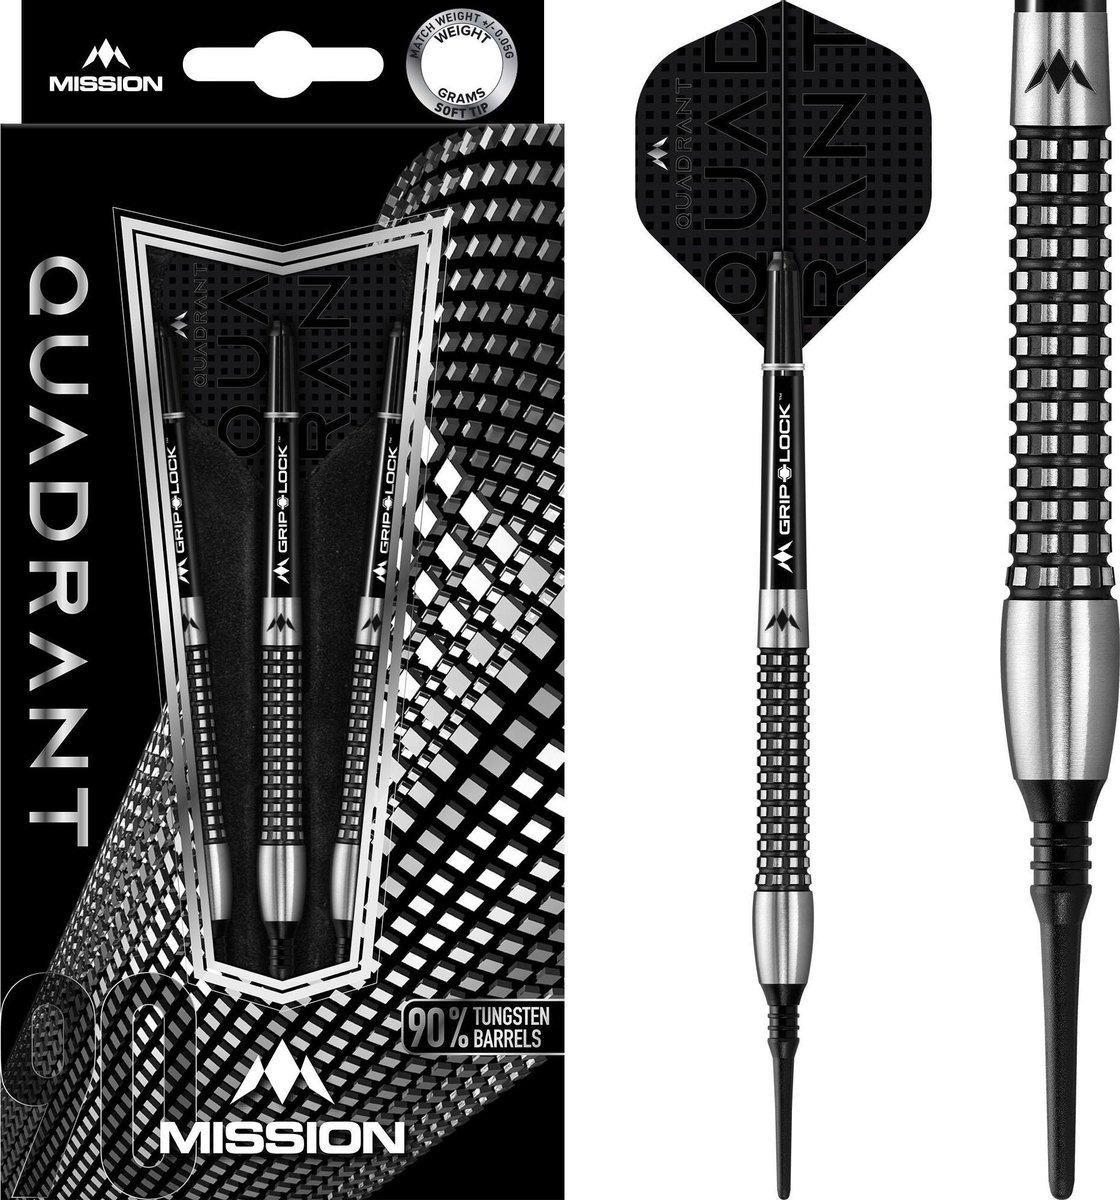 Mission Quadrant M3 90% Soft Tip - 21 Gram